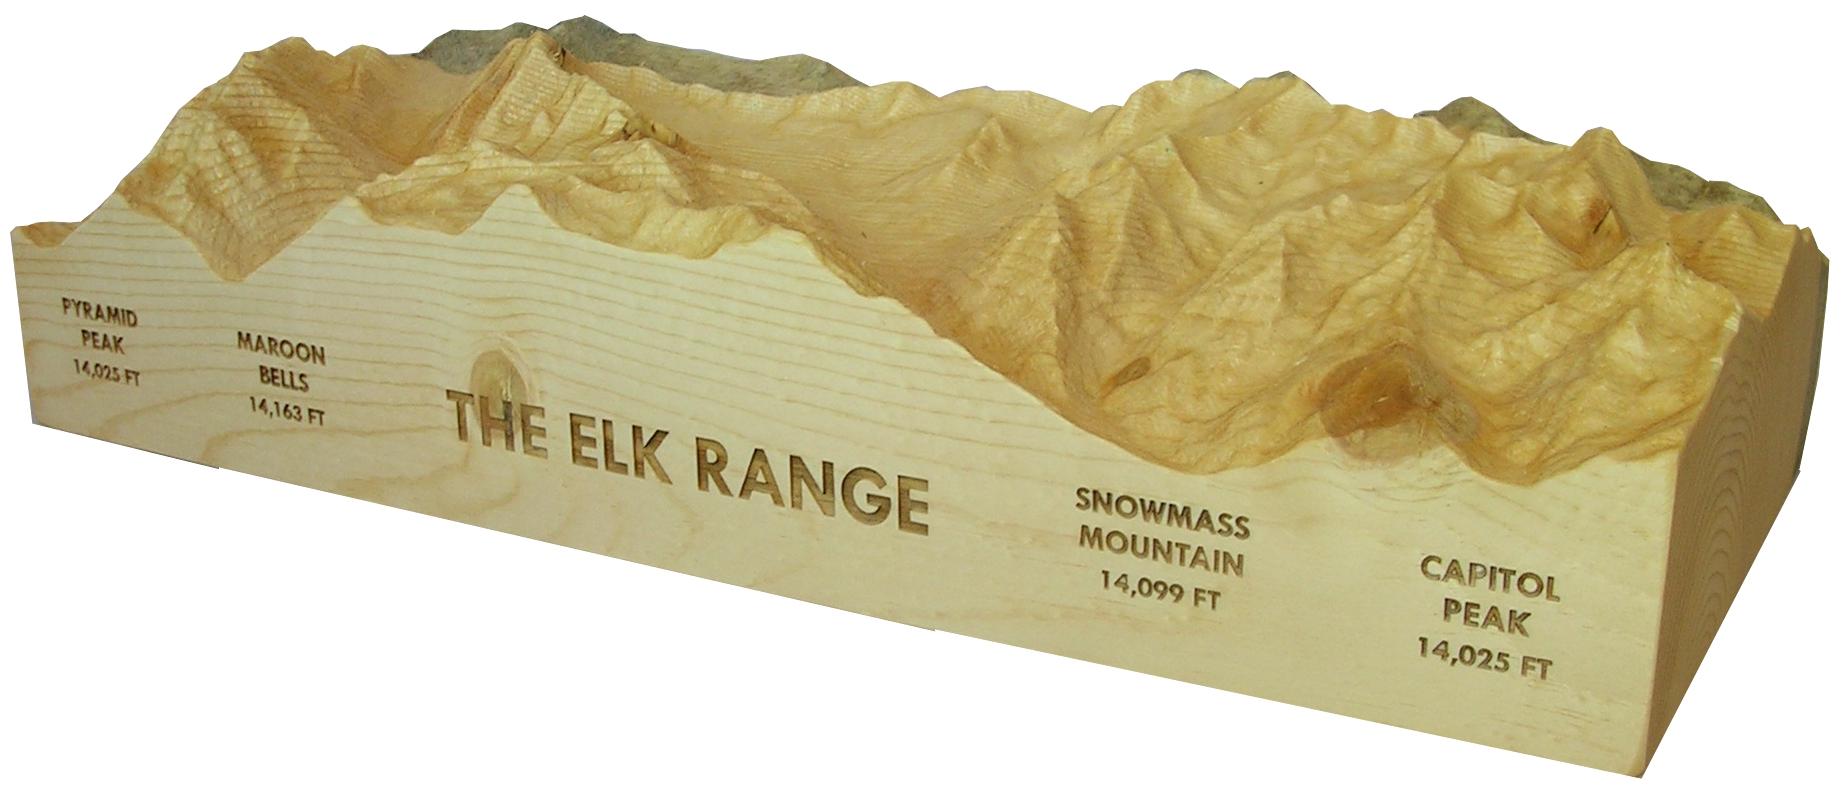 Elk-Range-Carving-Gift.jpg